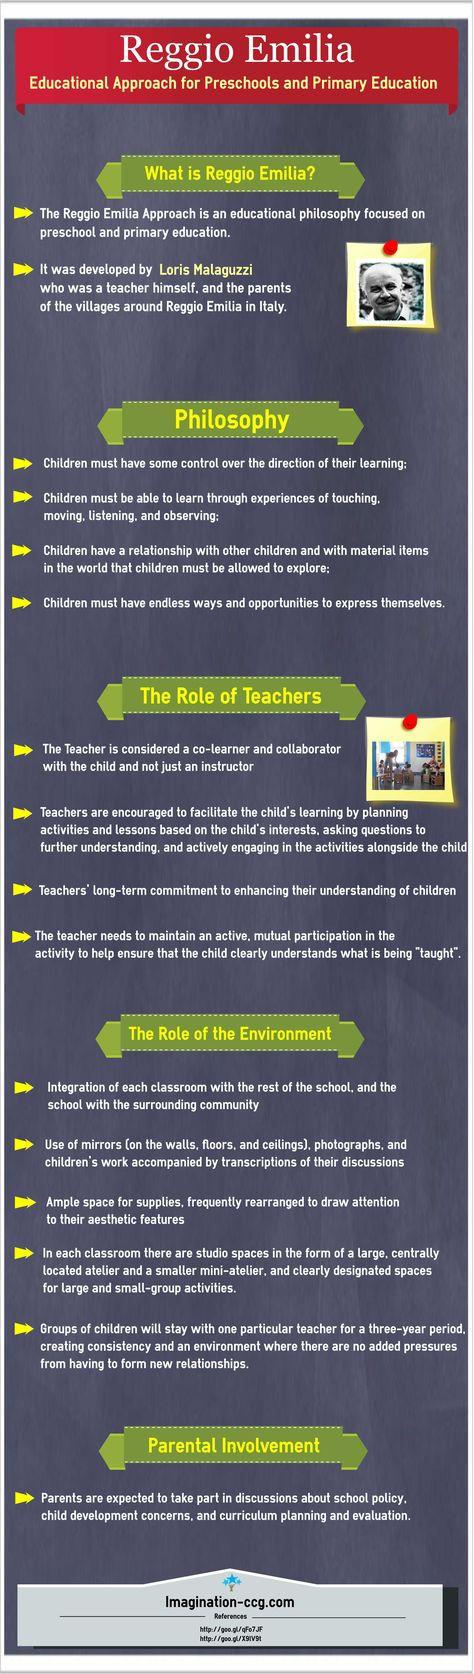 Reggio Emilia – Educational Approach for Preschools and Primary Education #Reggio Emilia #Educational Approach for Preschools